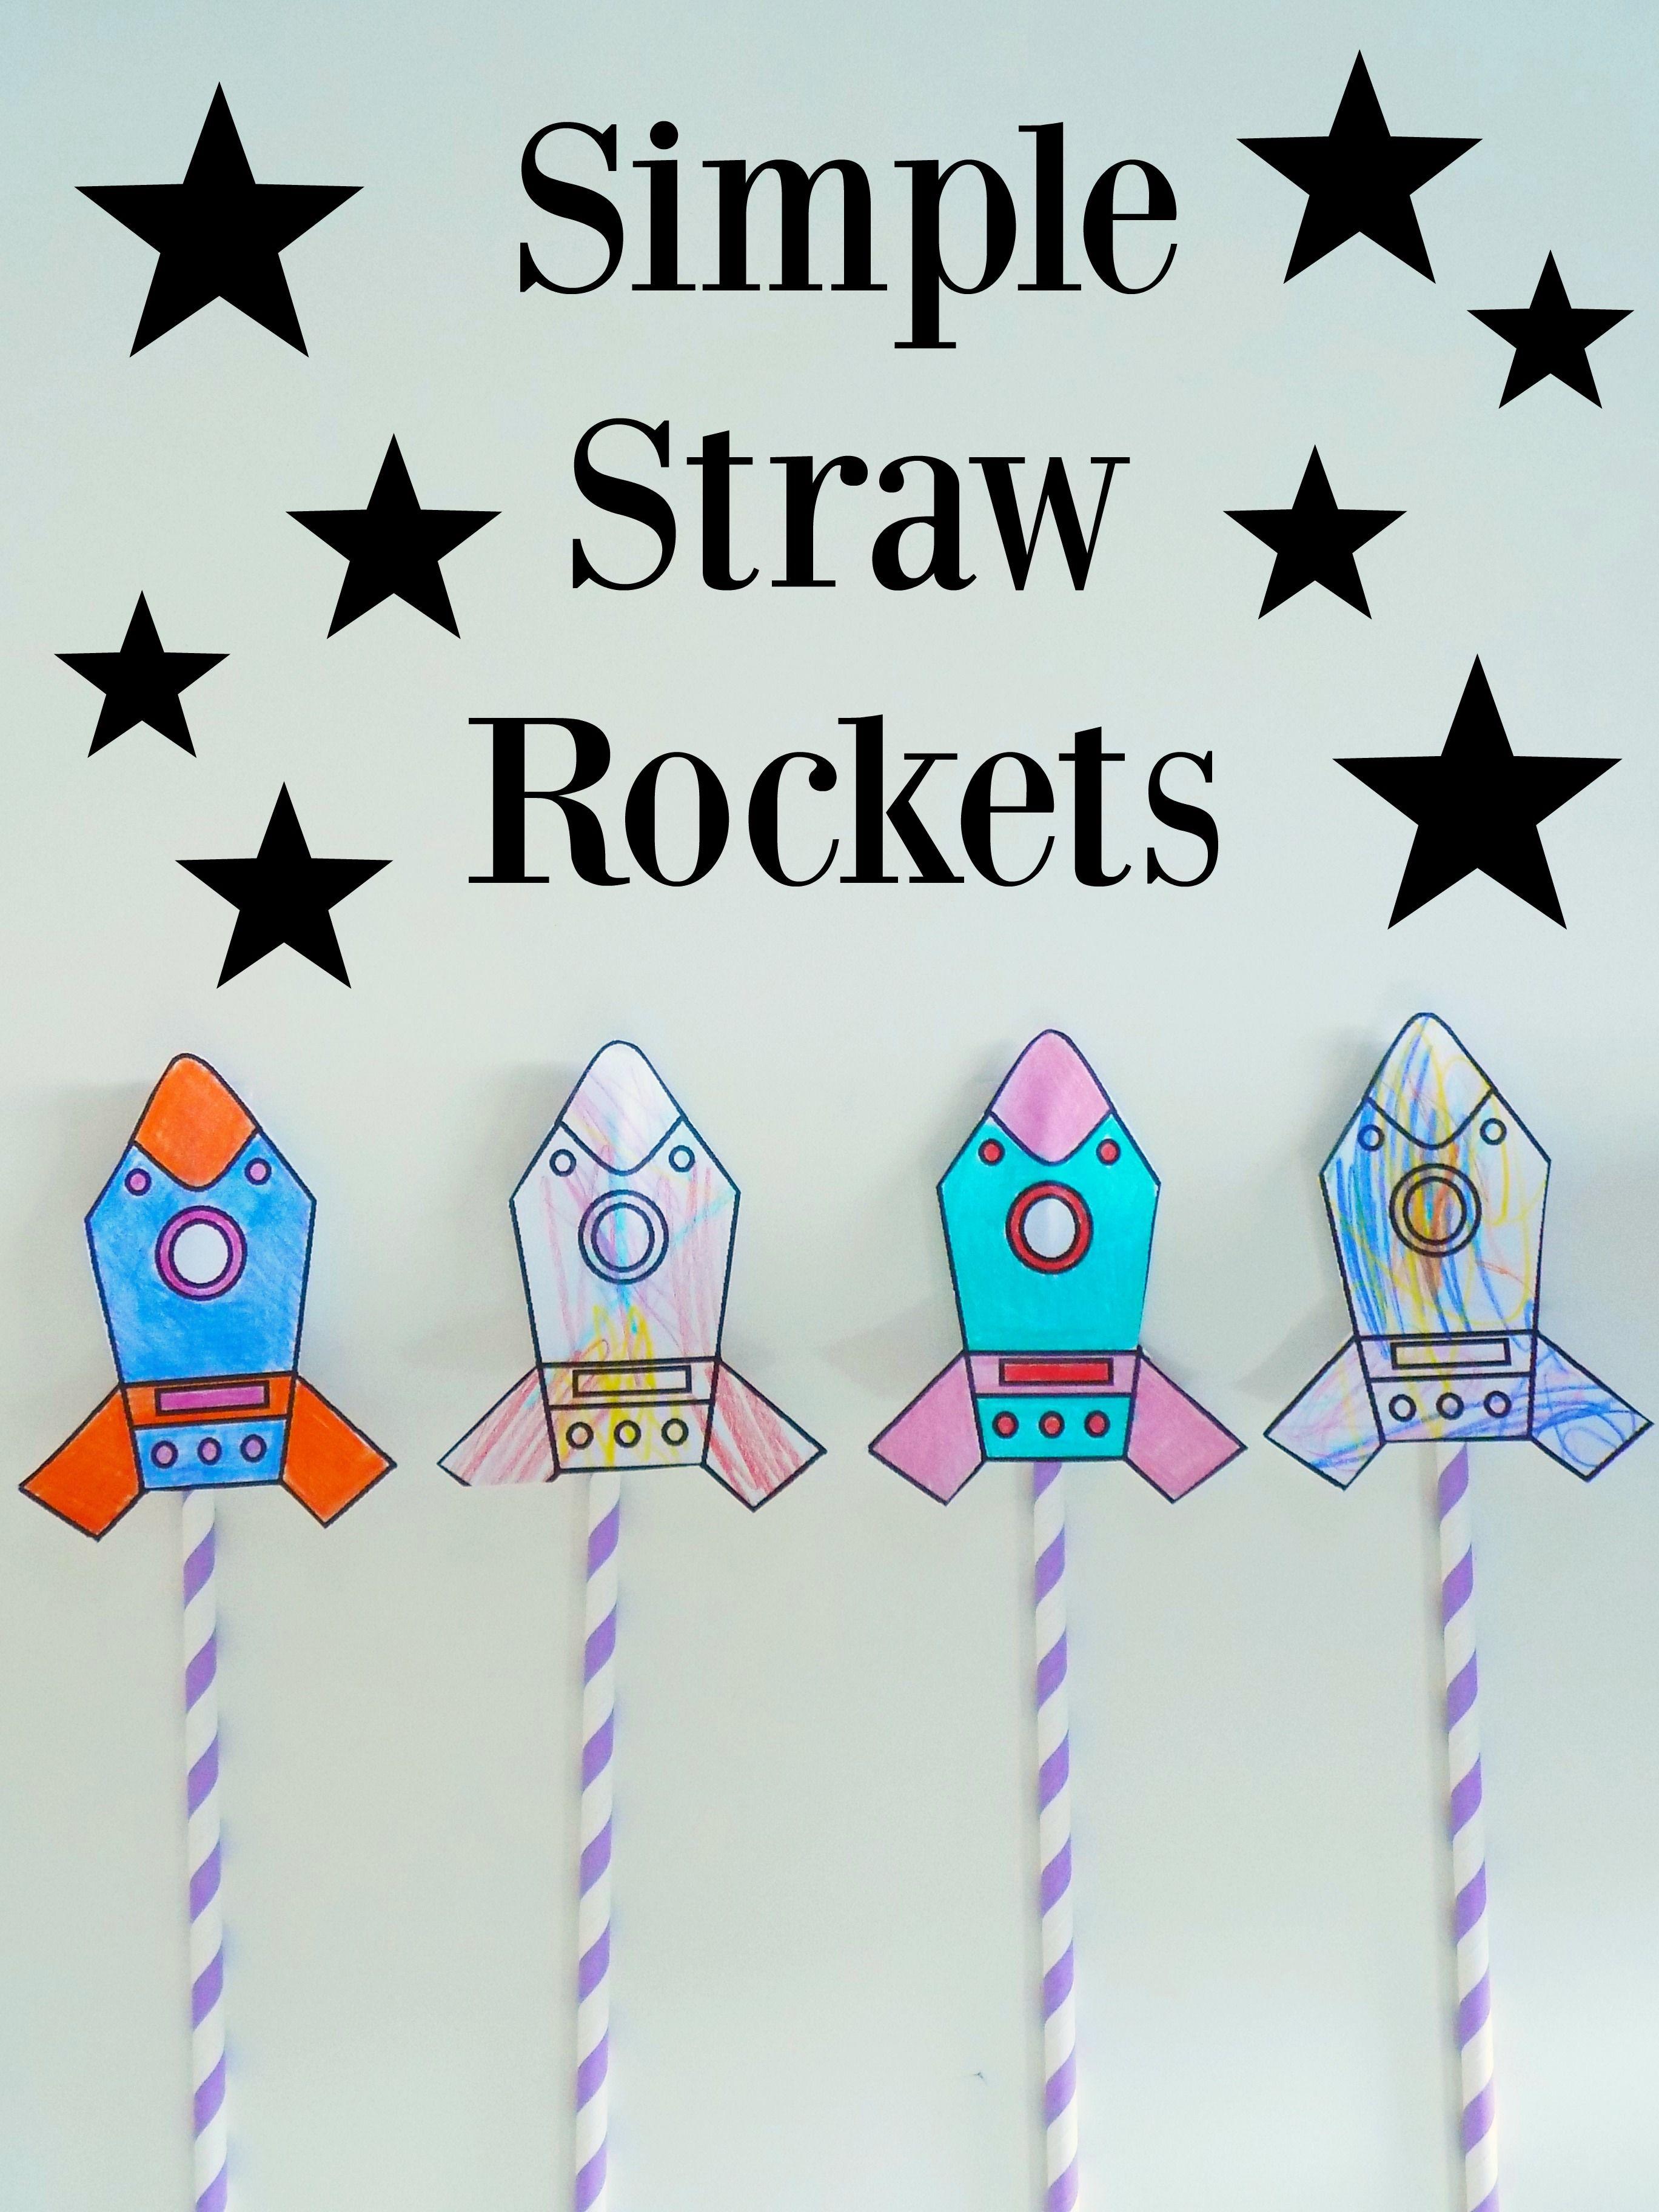 Simple Straw Rockets + Free Printable! | Preschool Education - Free Printable Crafts For Preschoolers